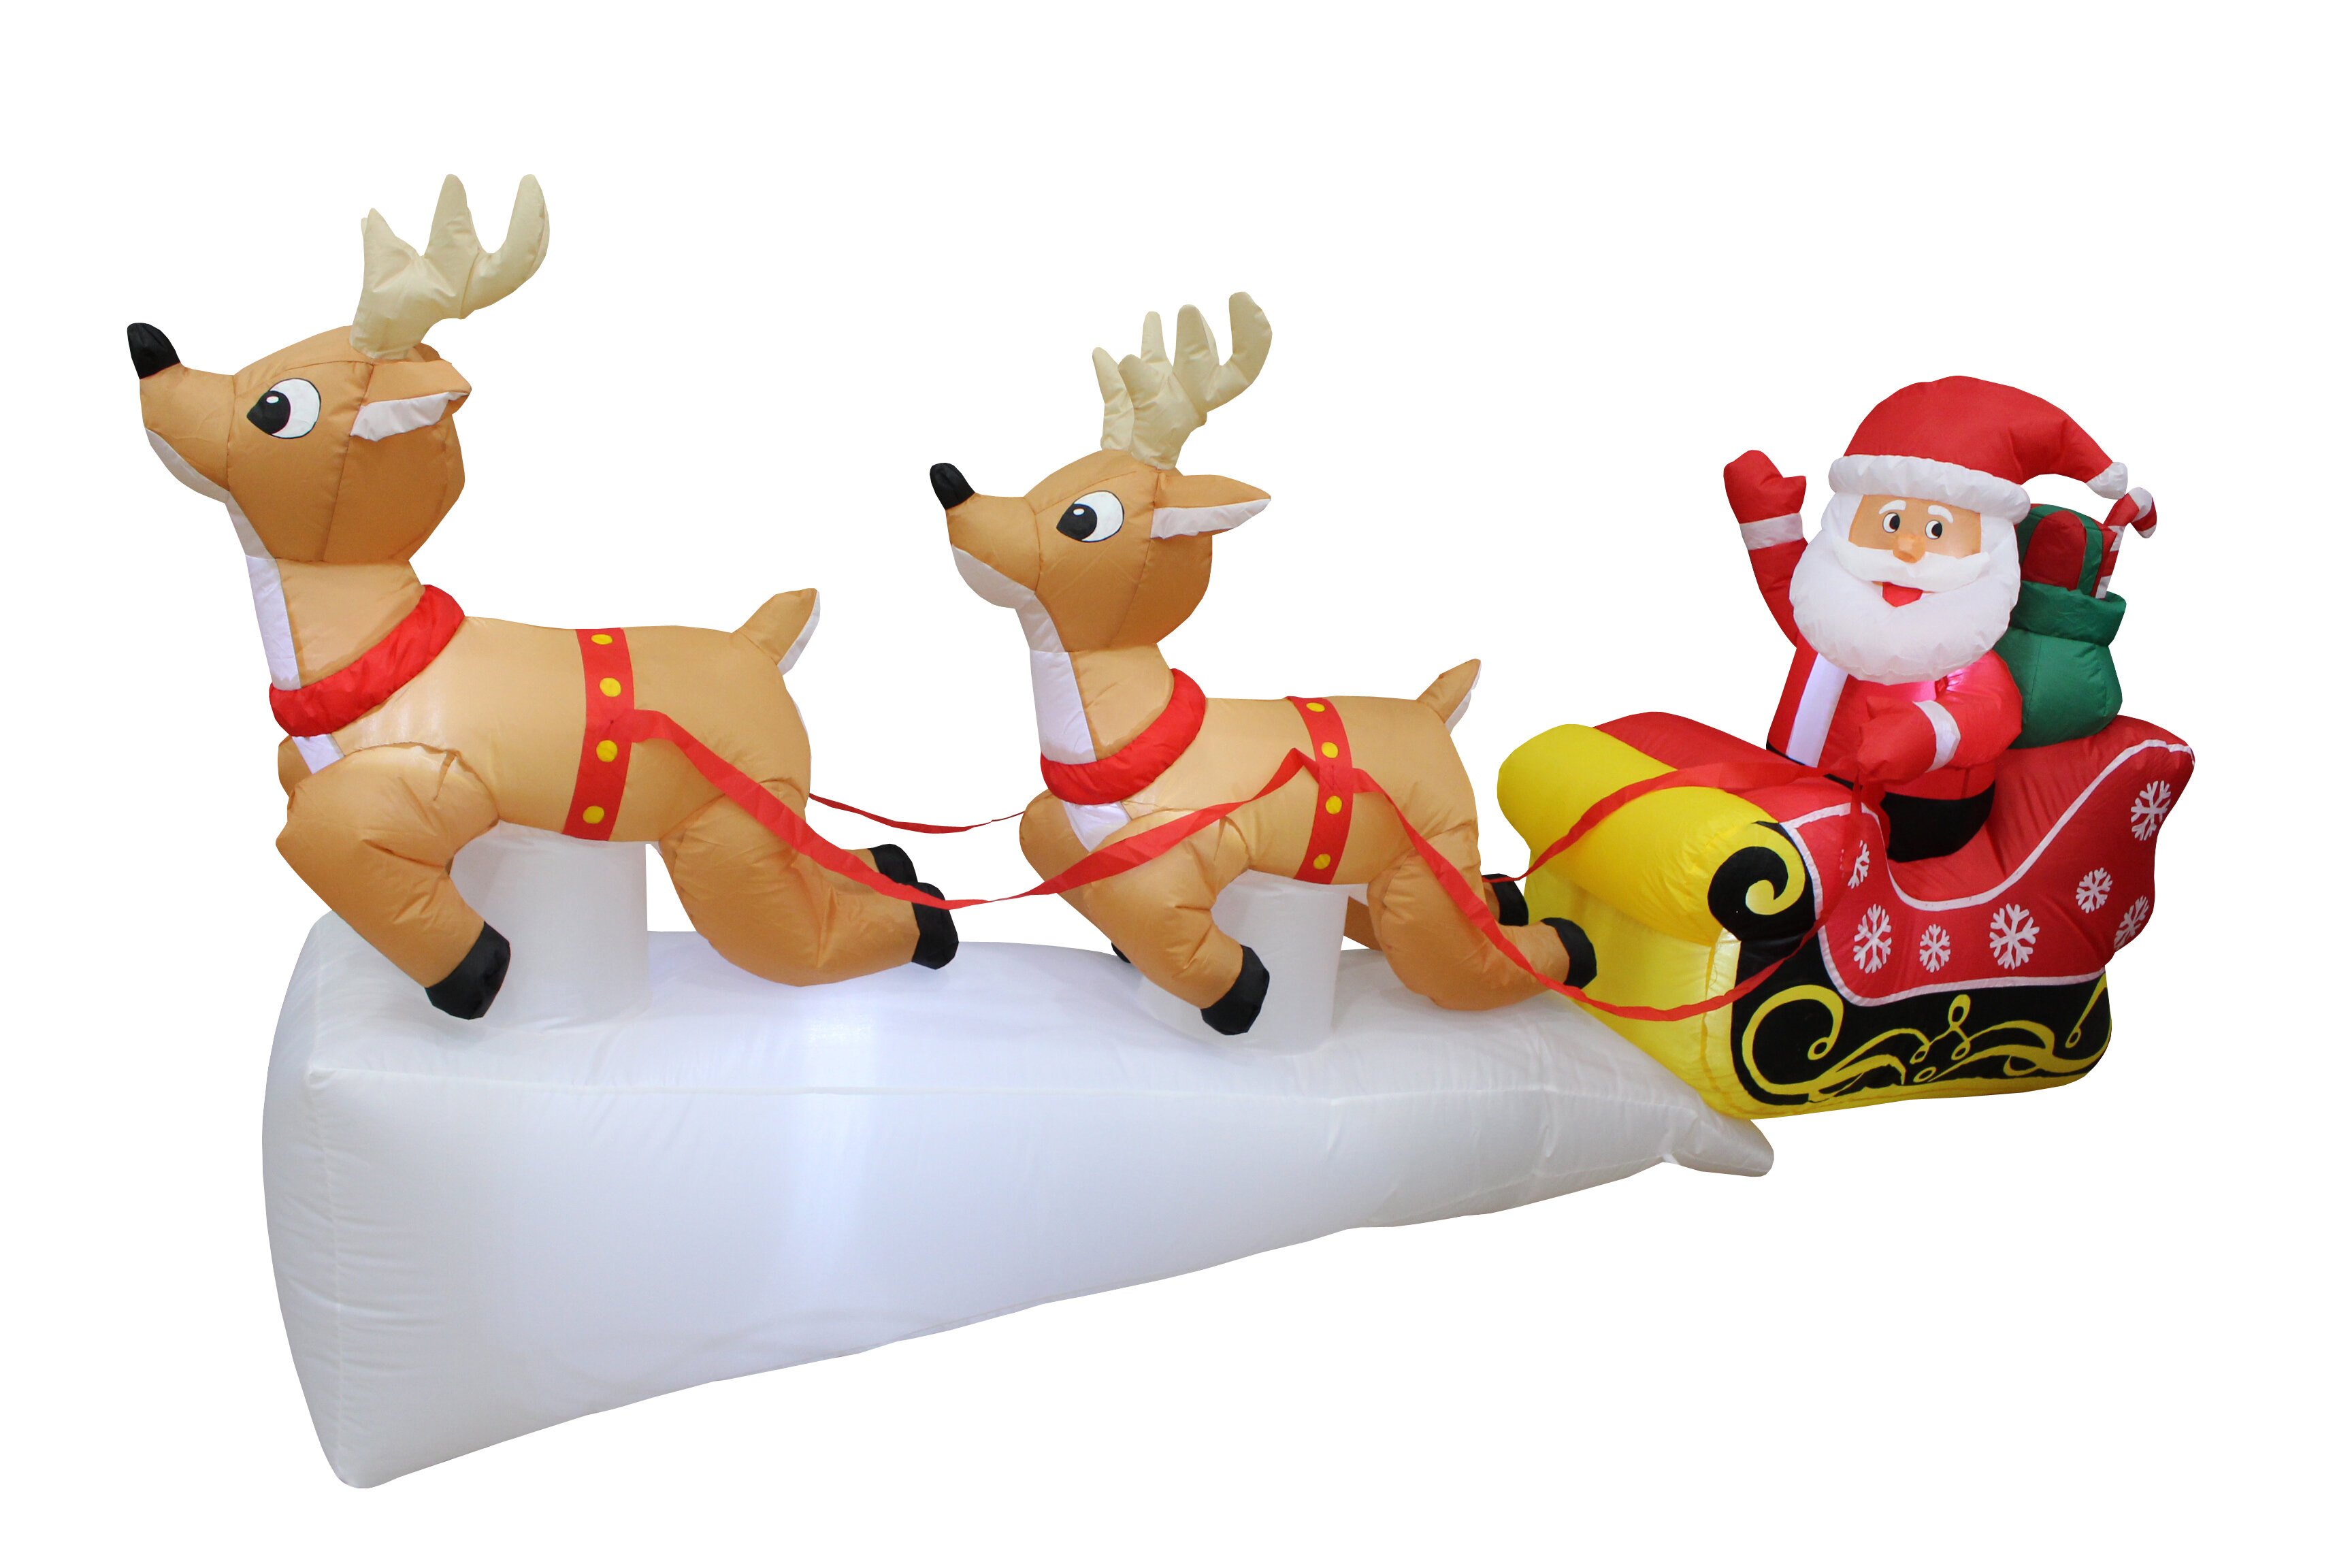 The Holiday Aisle Santa Claus Reindeer Sleigh Christmas Inflatable Reviews Wayfair